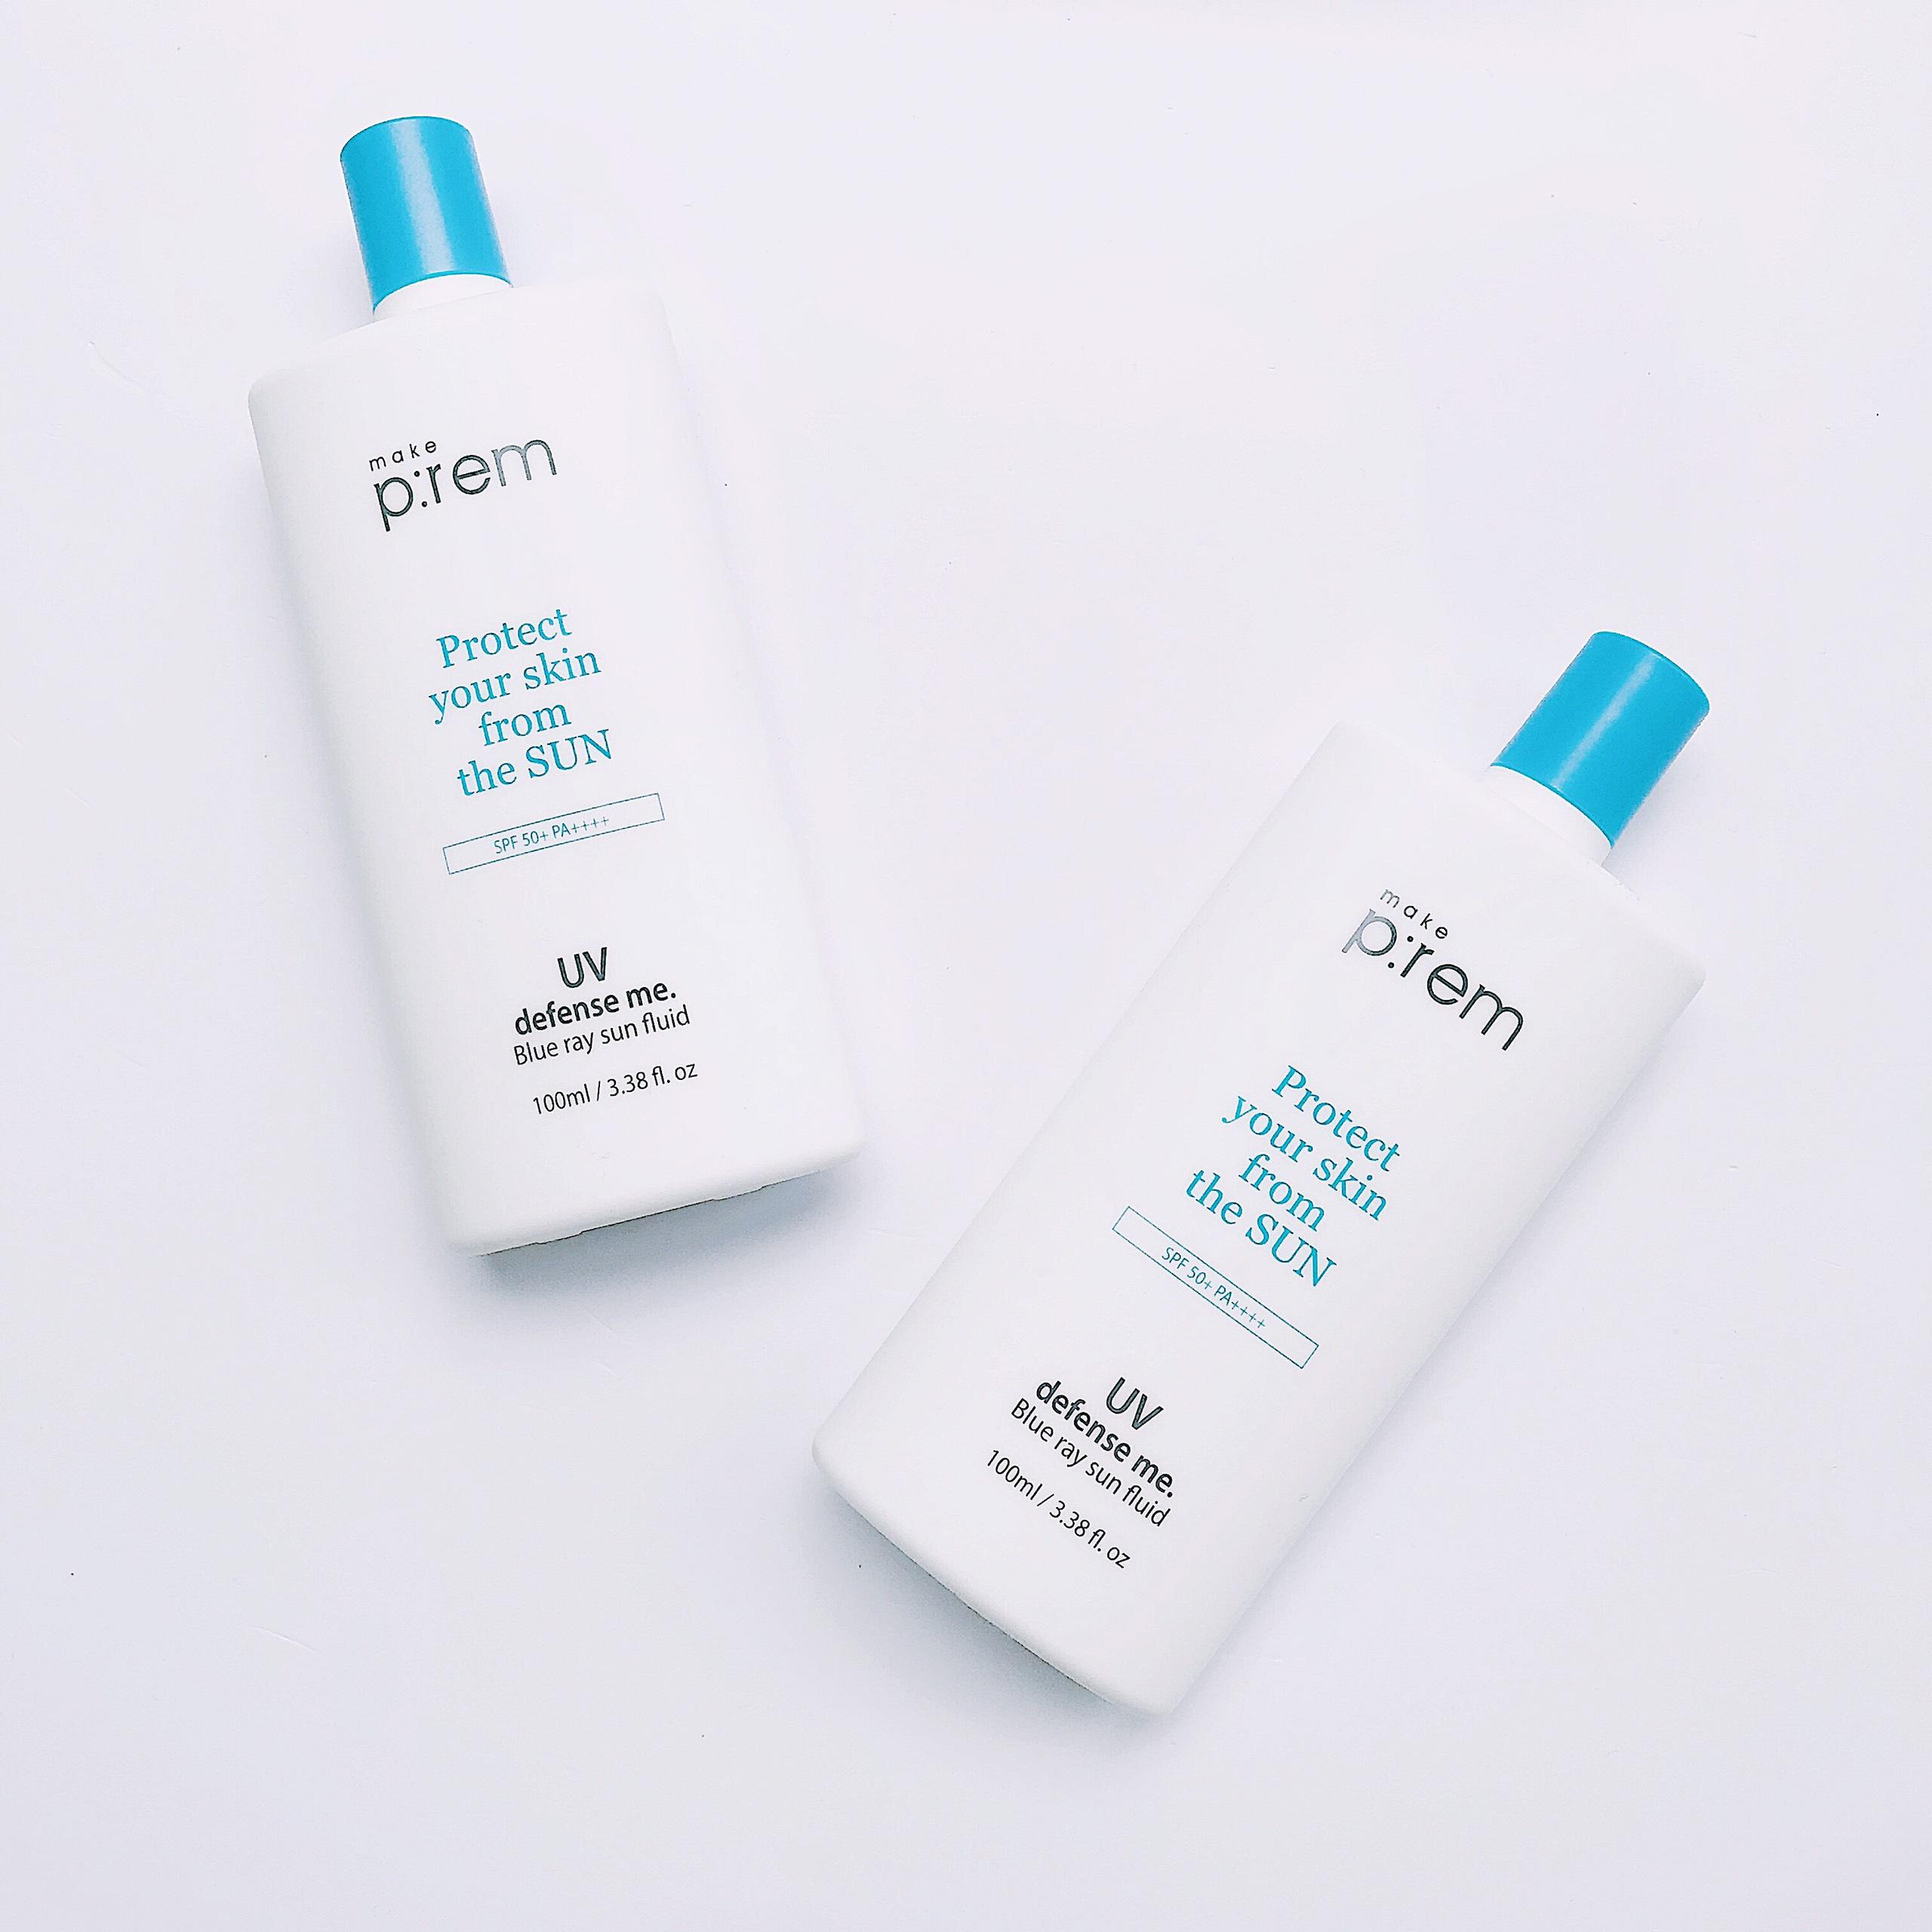 Kem Chống Nắng Make P:rem Protect UV Defense Me Blue Ray Fluid